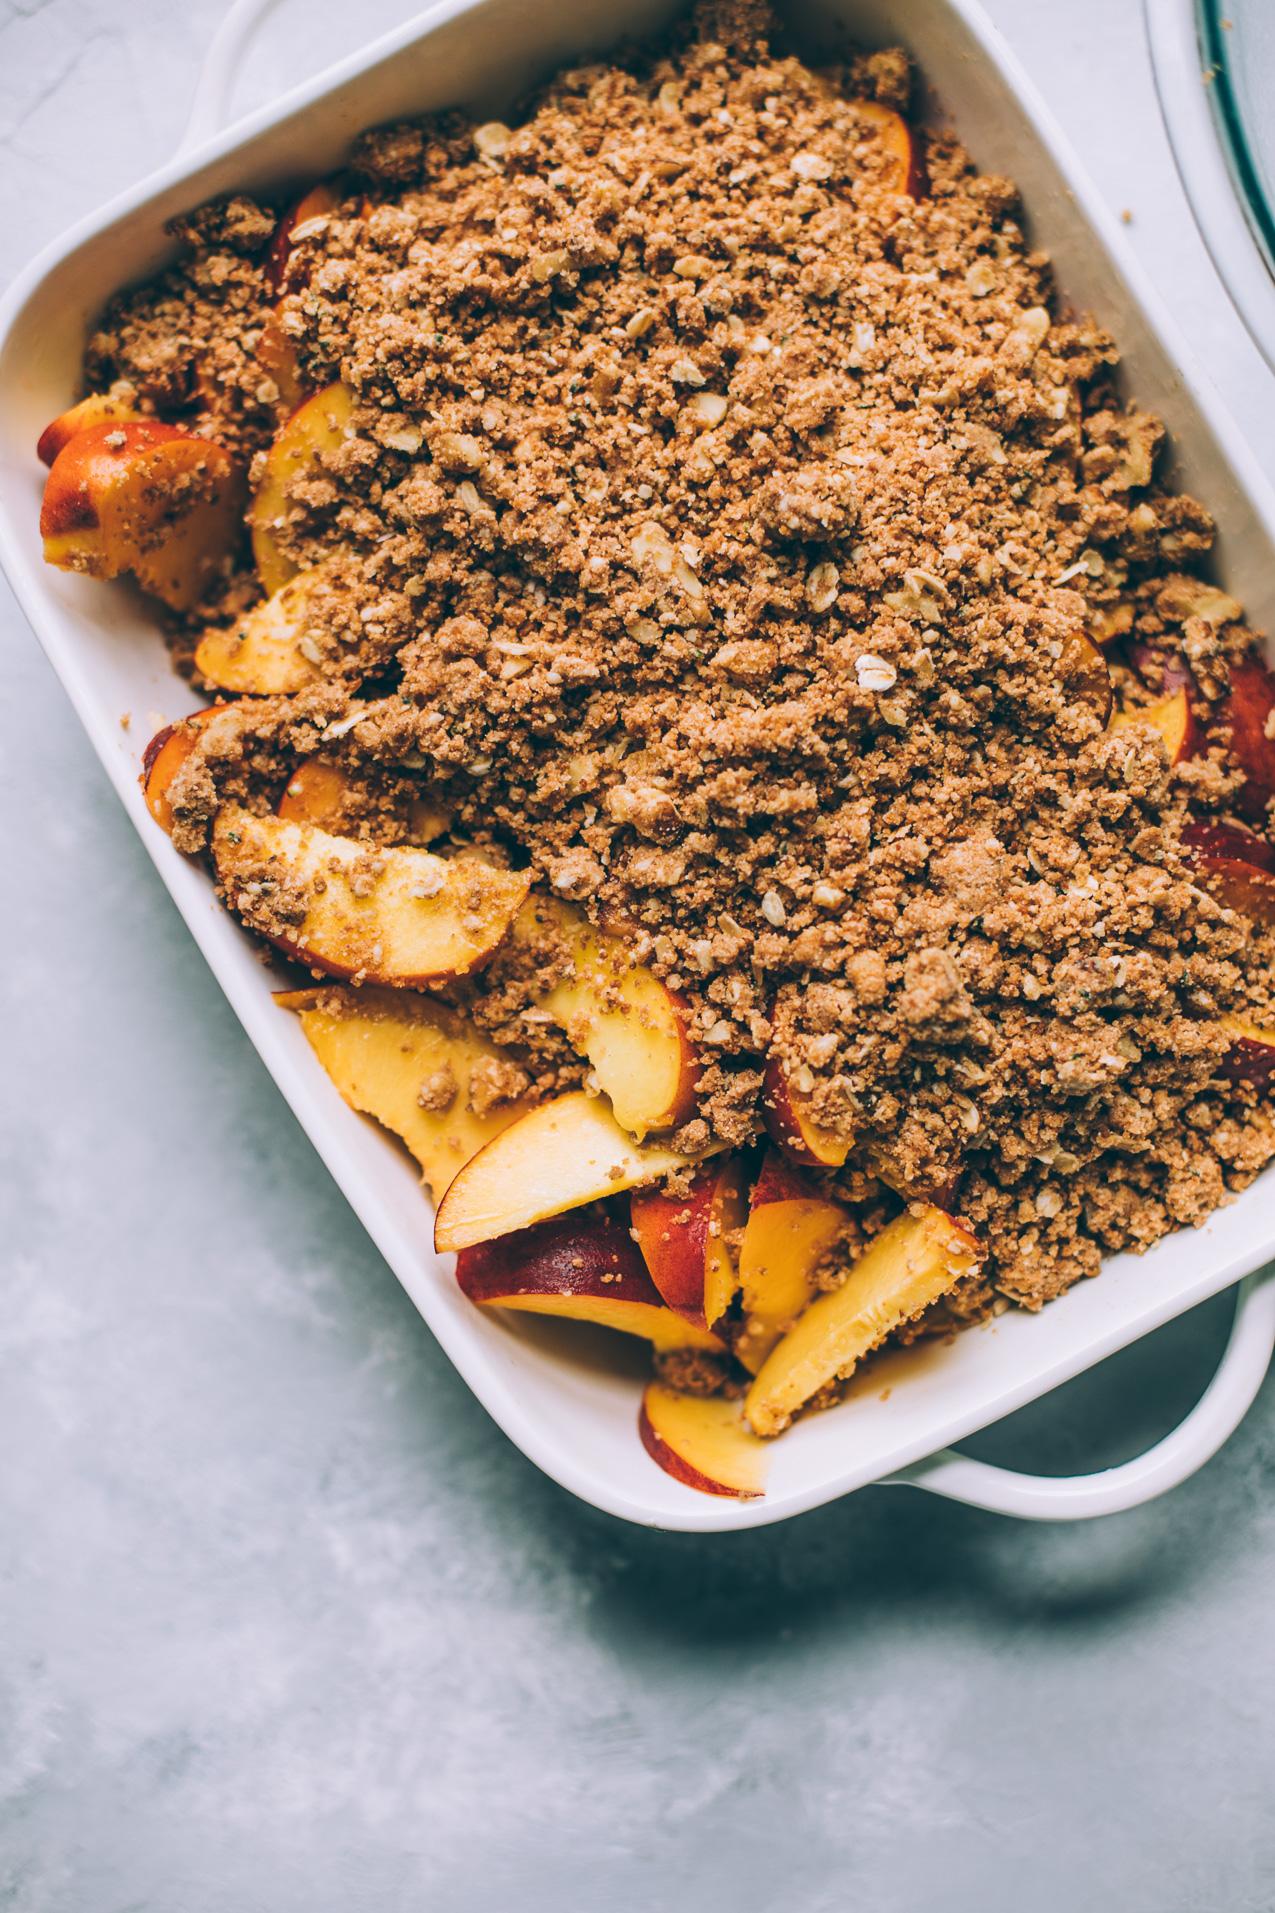 vegan peach crumble with walnut oat crumble, southern style | coconut oil crumble | vegan crisp recipe | healthy fruit crumble recipe | southern peach crisp